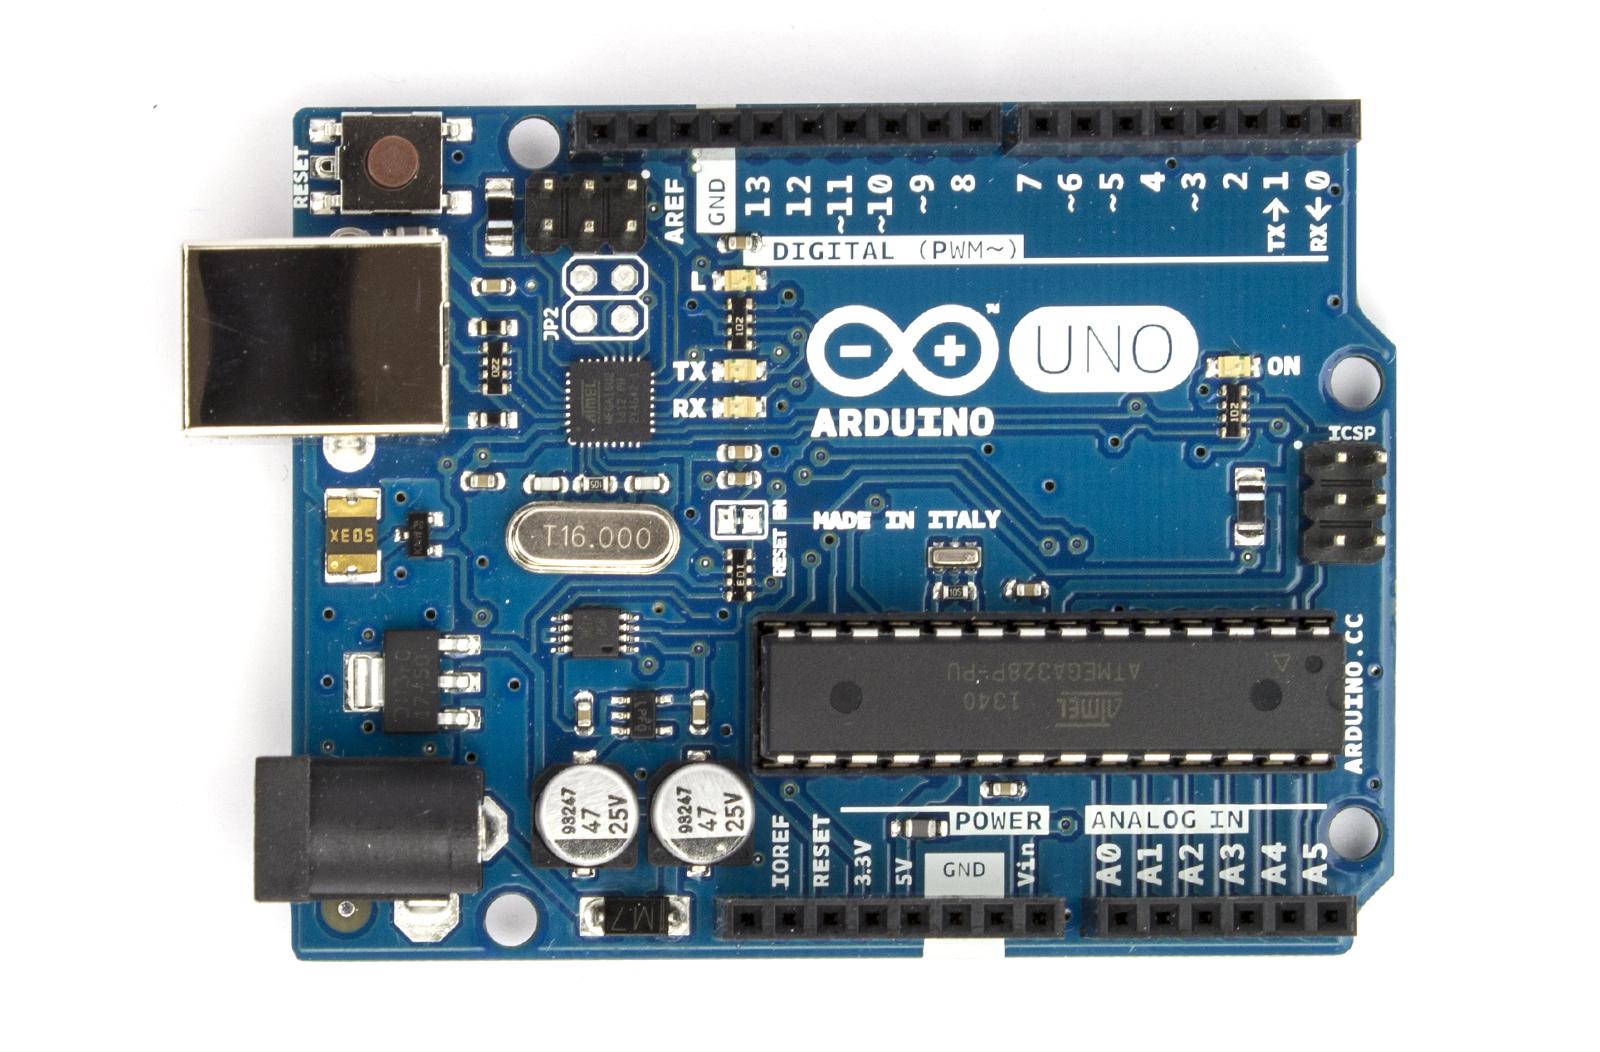 https://www.arduino.cc/en/uploads/Main/ArduinoUno_R3_Front.jpg